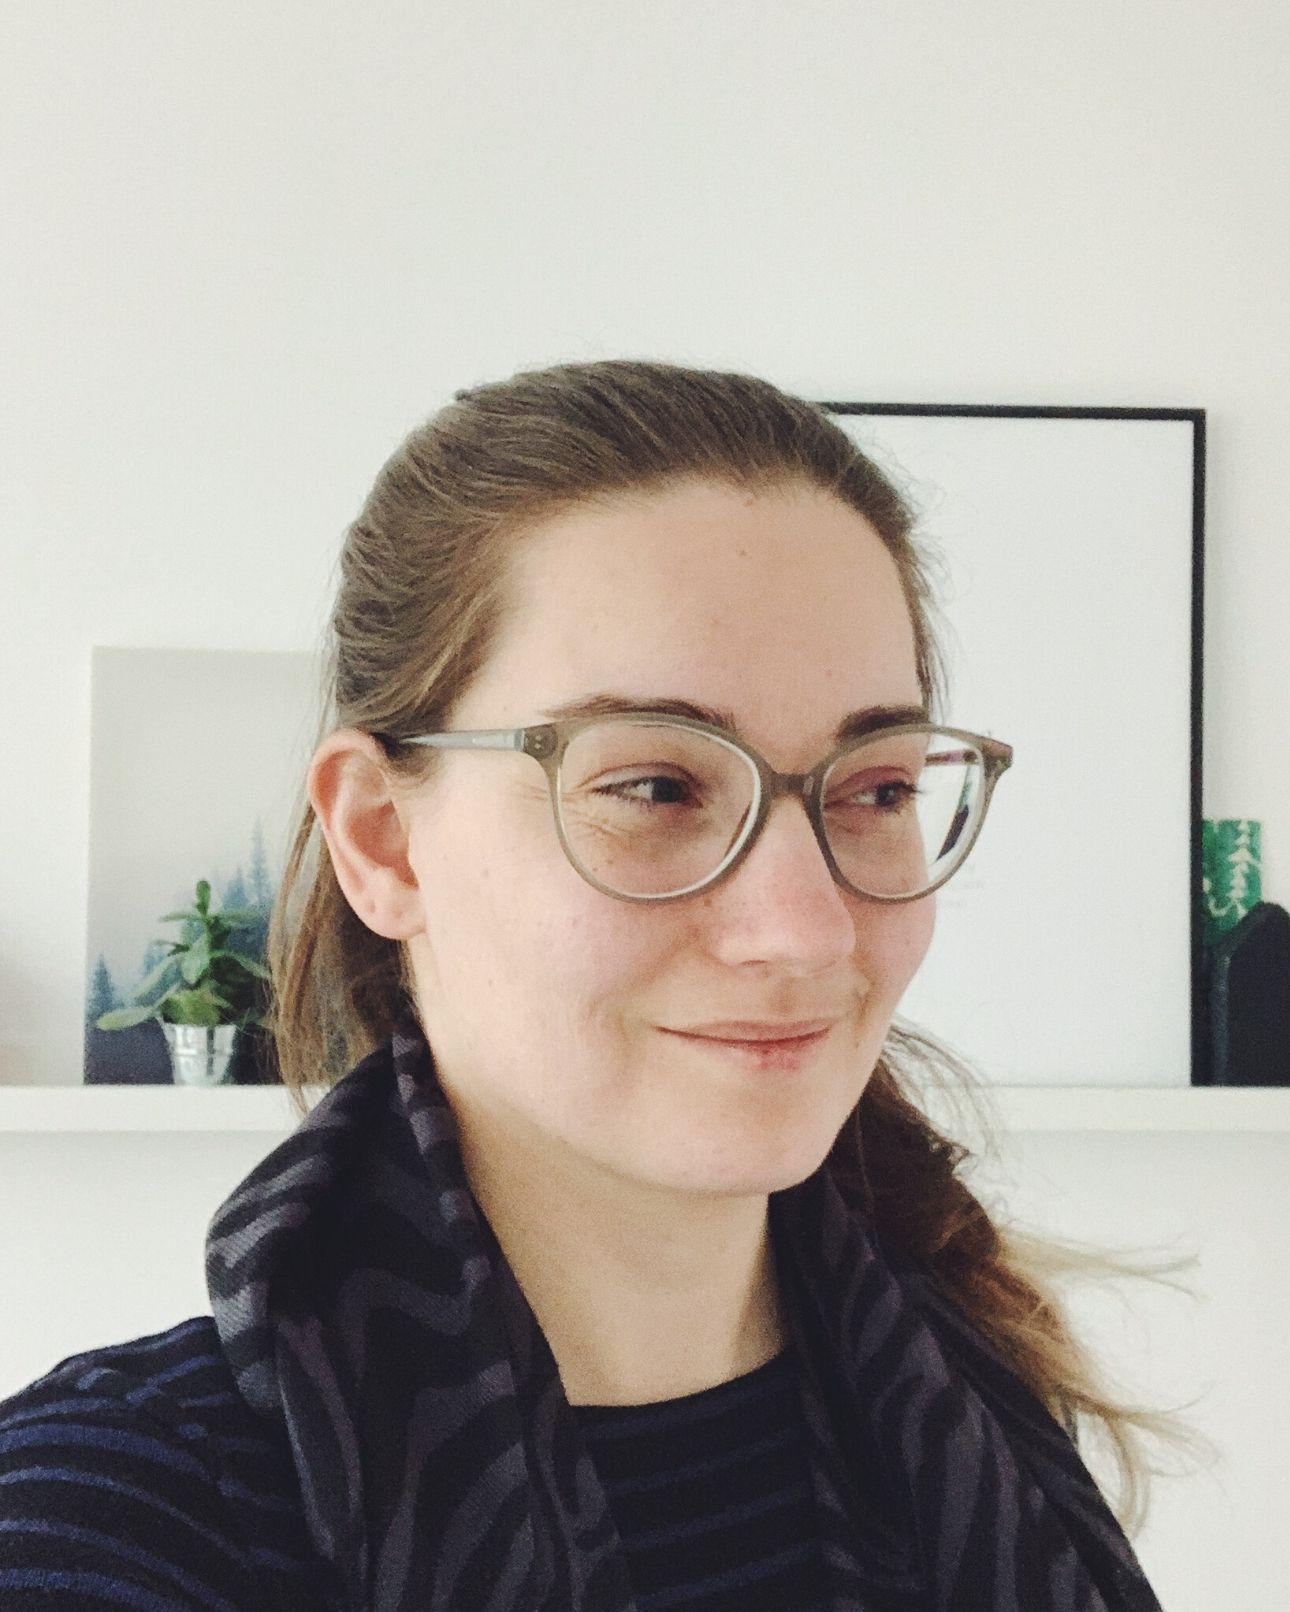 Marike nieuwe bril Specsavers